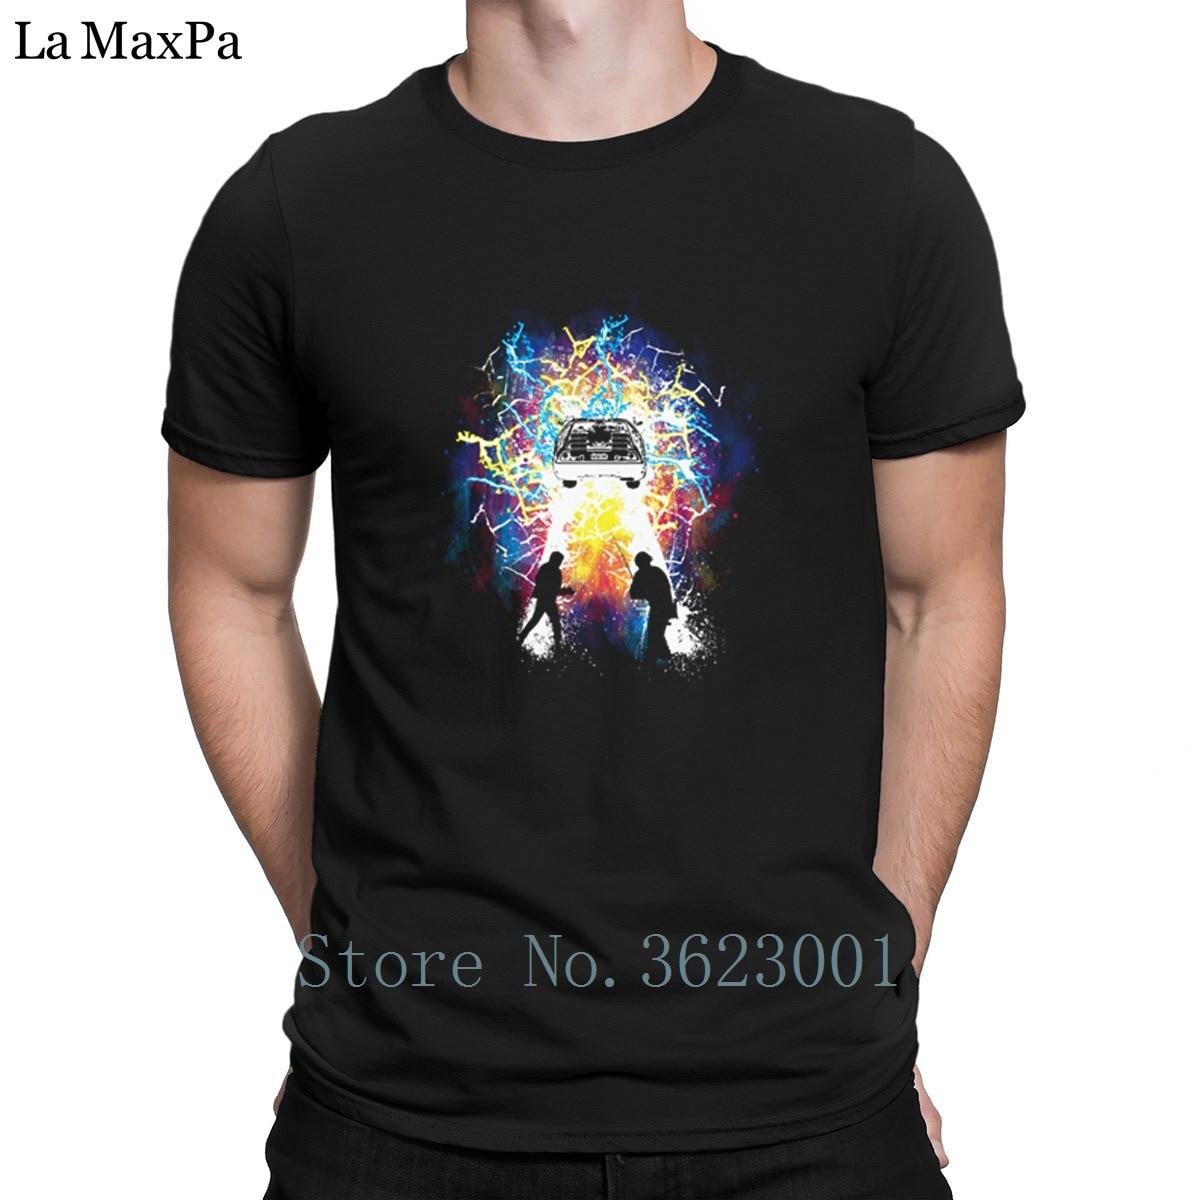 Designer Novelty Tee Shirt Time Travelers T-Shirt Man Cotton Simple Loose T Shirt Basic Tee Shirt For Mens Streetwear Stylish